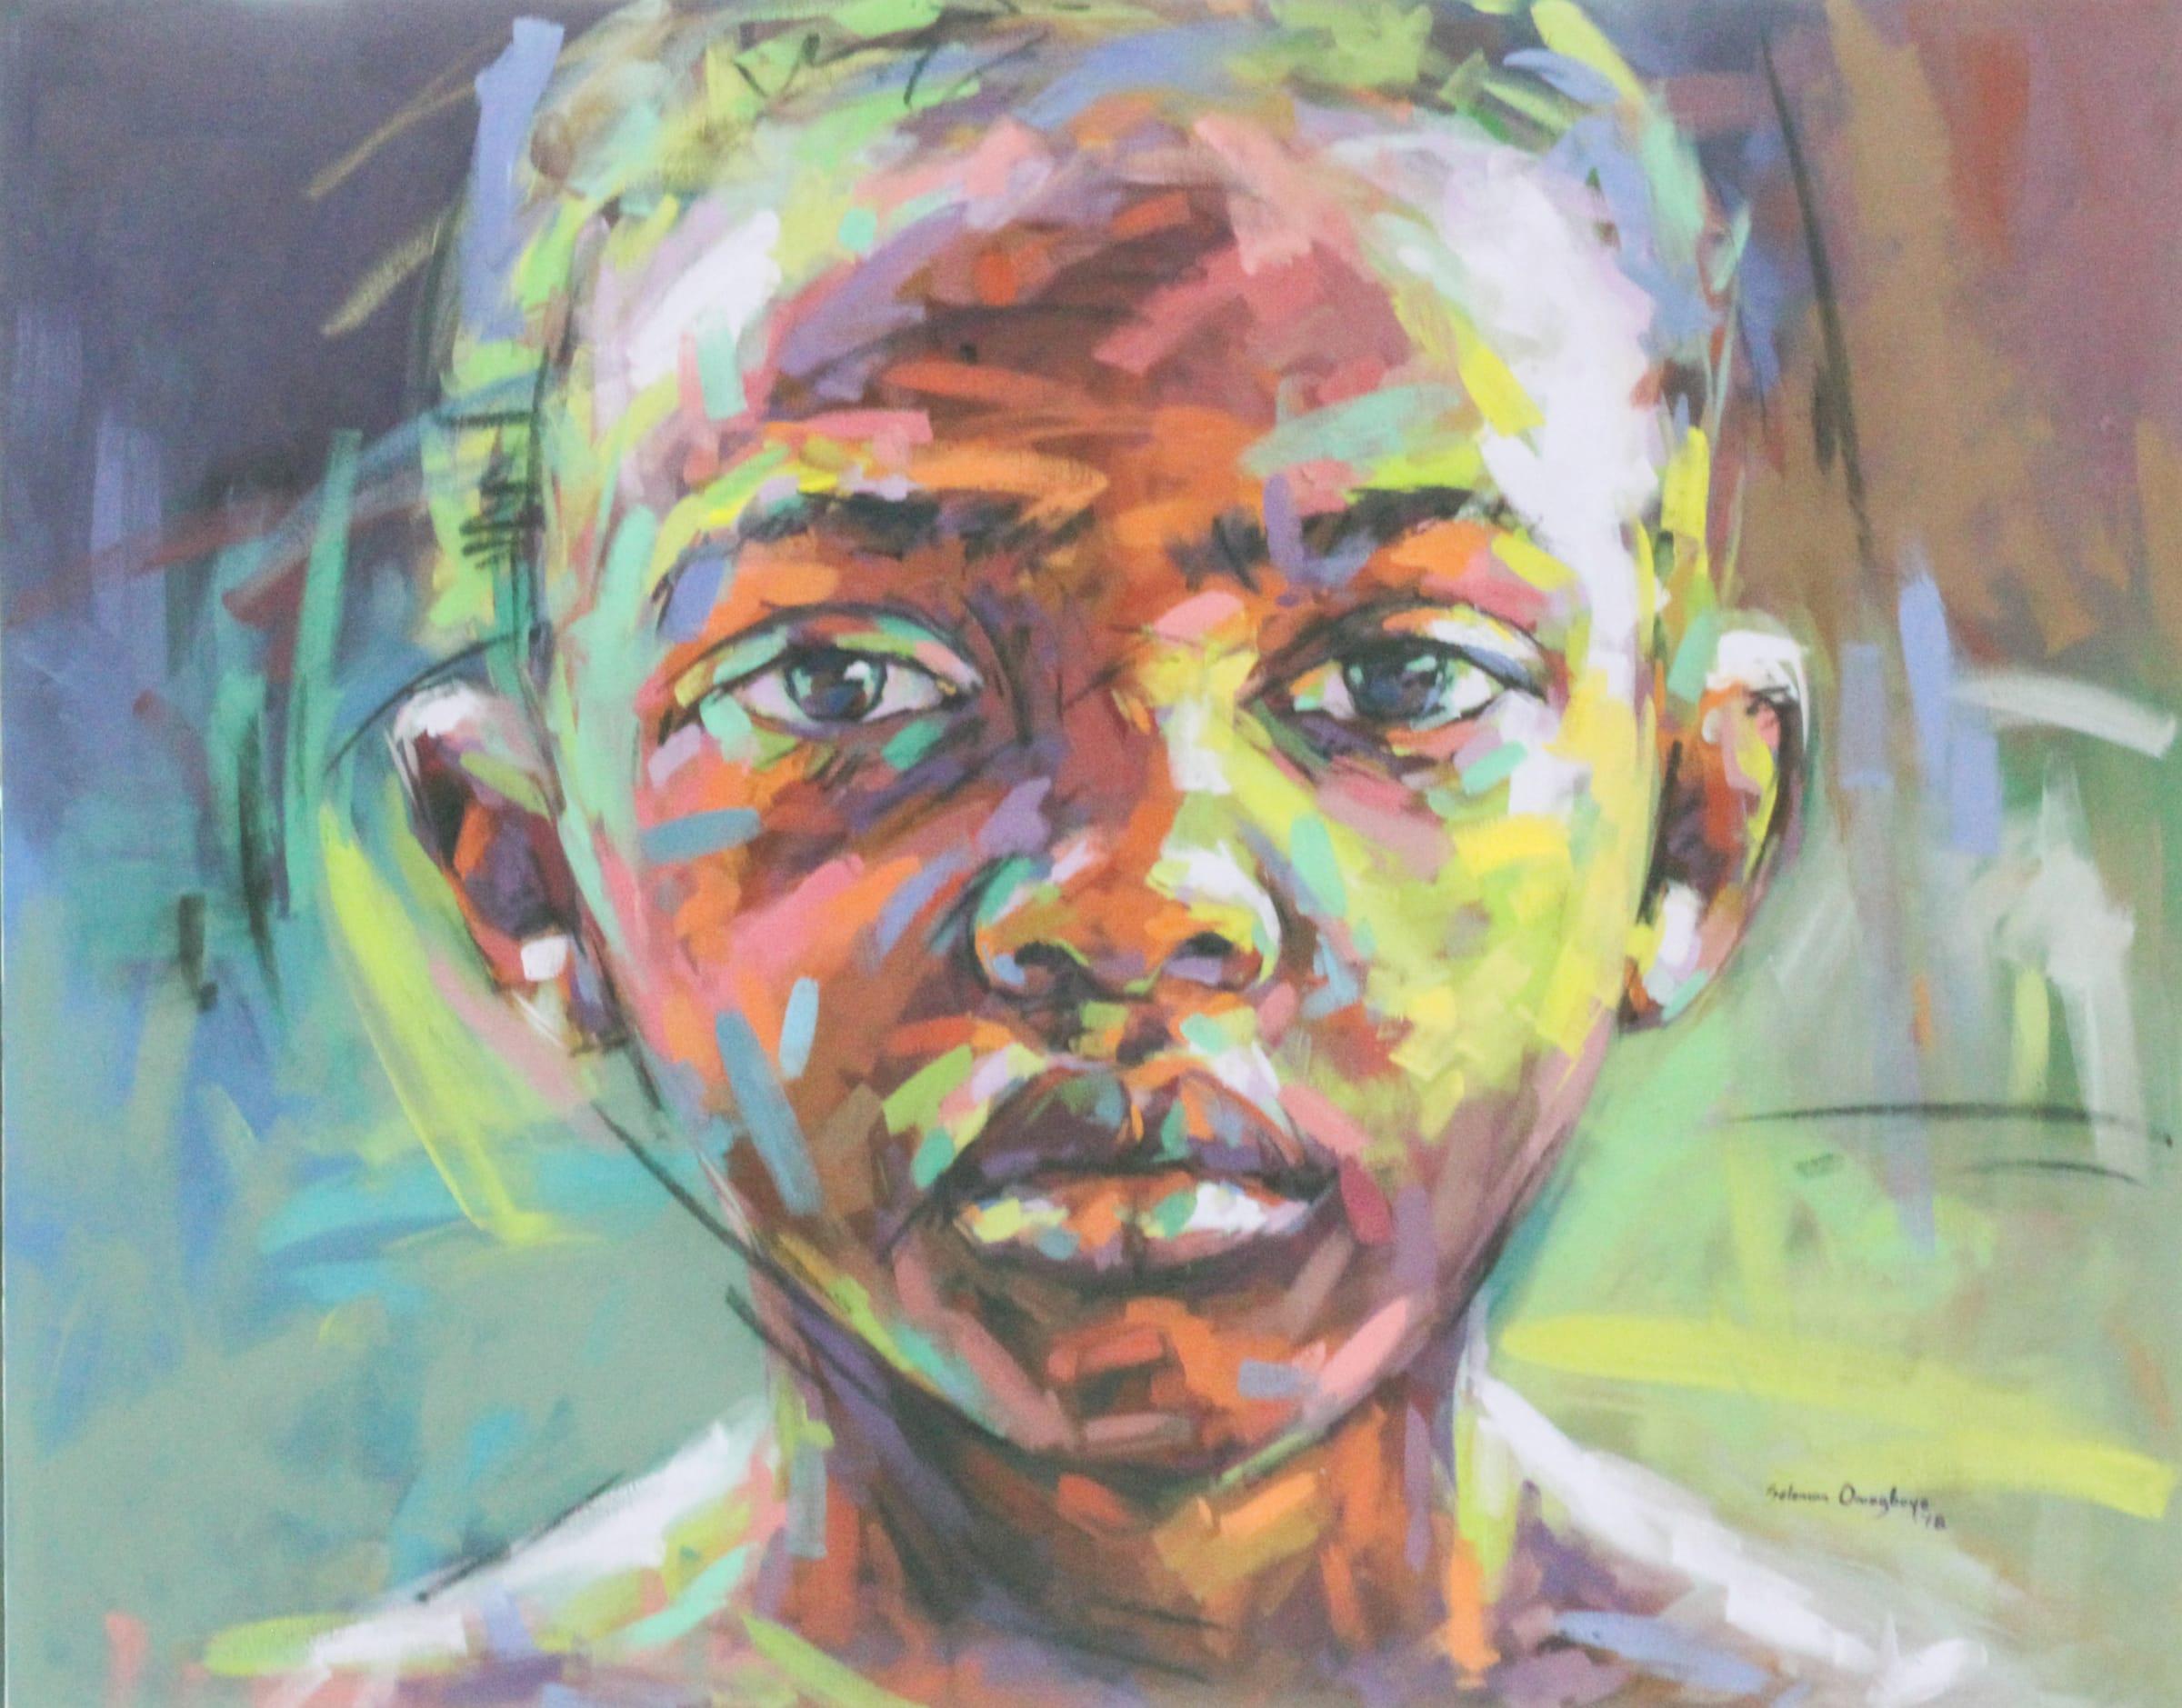 <span class=&#34;link fancybox-details-link&#34;><a href=&#34;/artists/39-solomon-omogboye/works/3291-solomon-omogboye-hope-alive-2018/&#34;>View Detail Page</a></span><div class=&#34;artist&#34;><strong>Solomon Omogboye</strong></div> <div class=&#34;title&#34;><em>Hope Alive</em>, 2018</div> <div class=&#34;medium&#34;>Oil On Canvas</div> <div class=&#34;dimensions&#34;>150cm x 120cm</div><div class=&#34;price&#34;>R40,000.00</div>